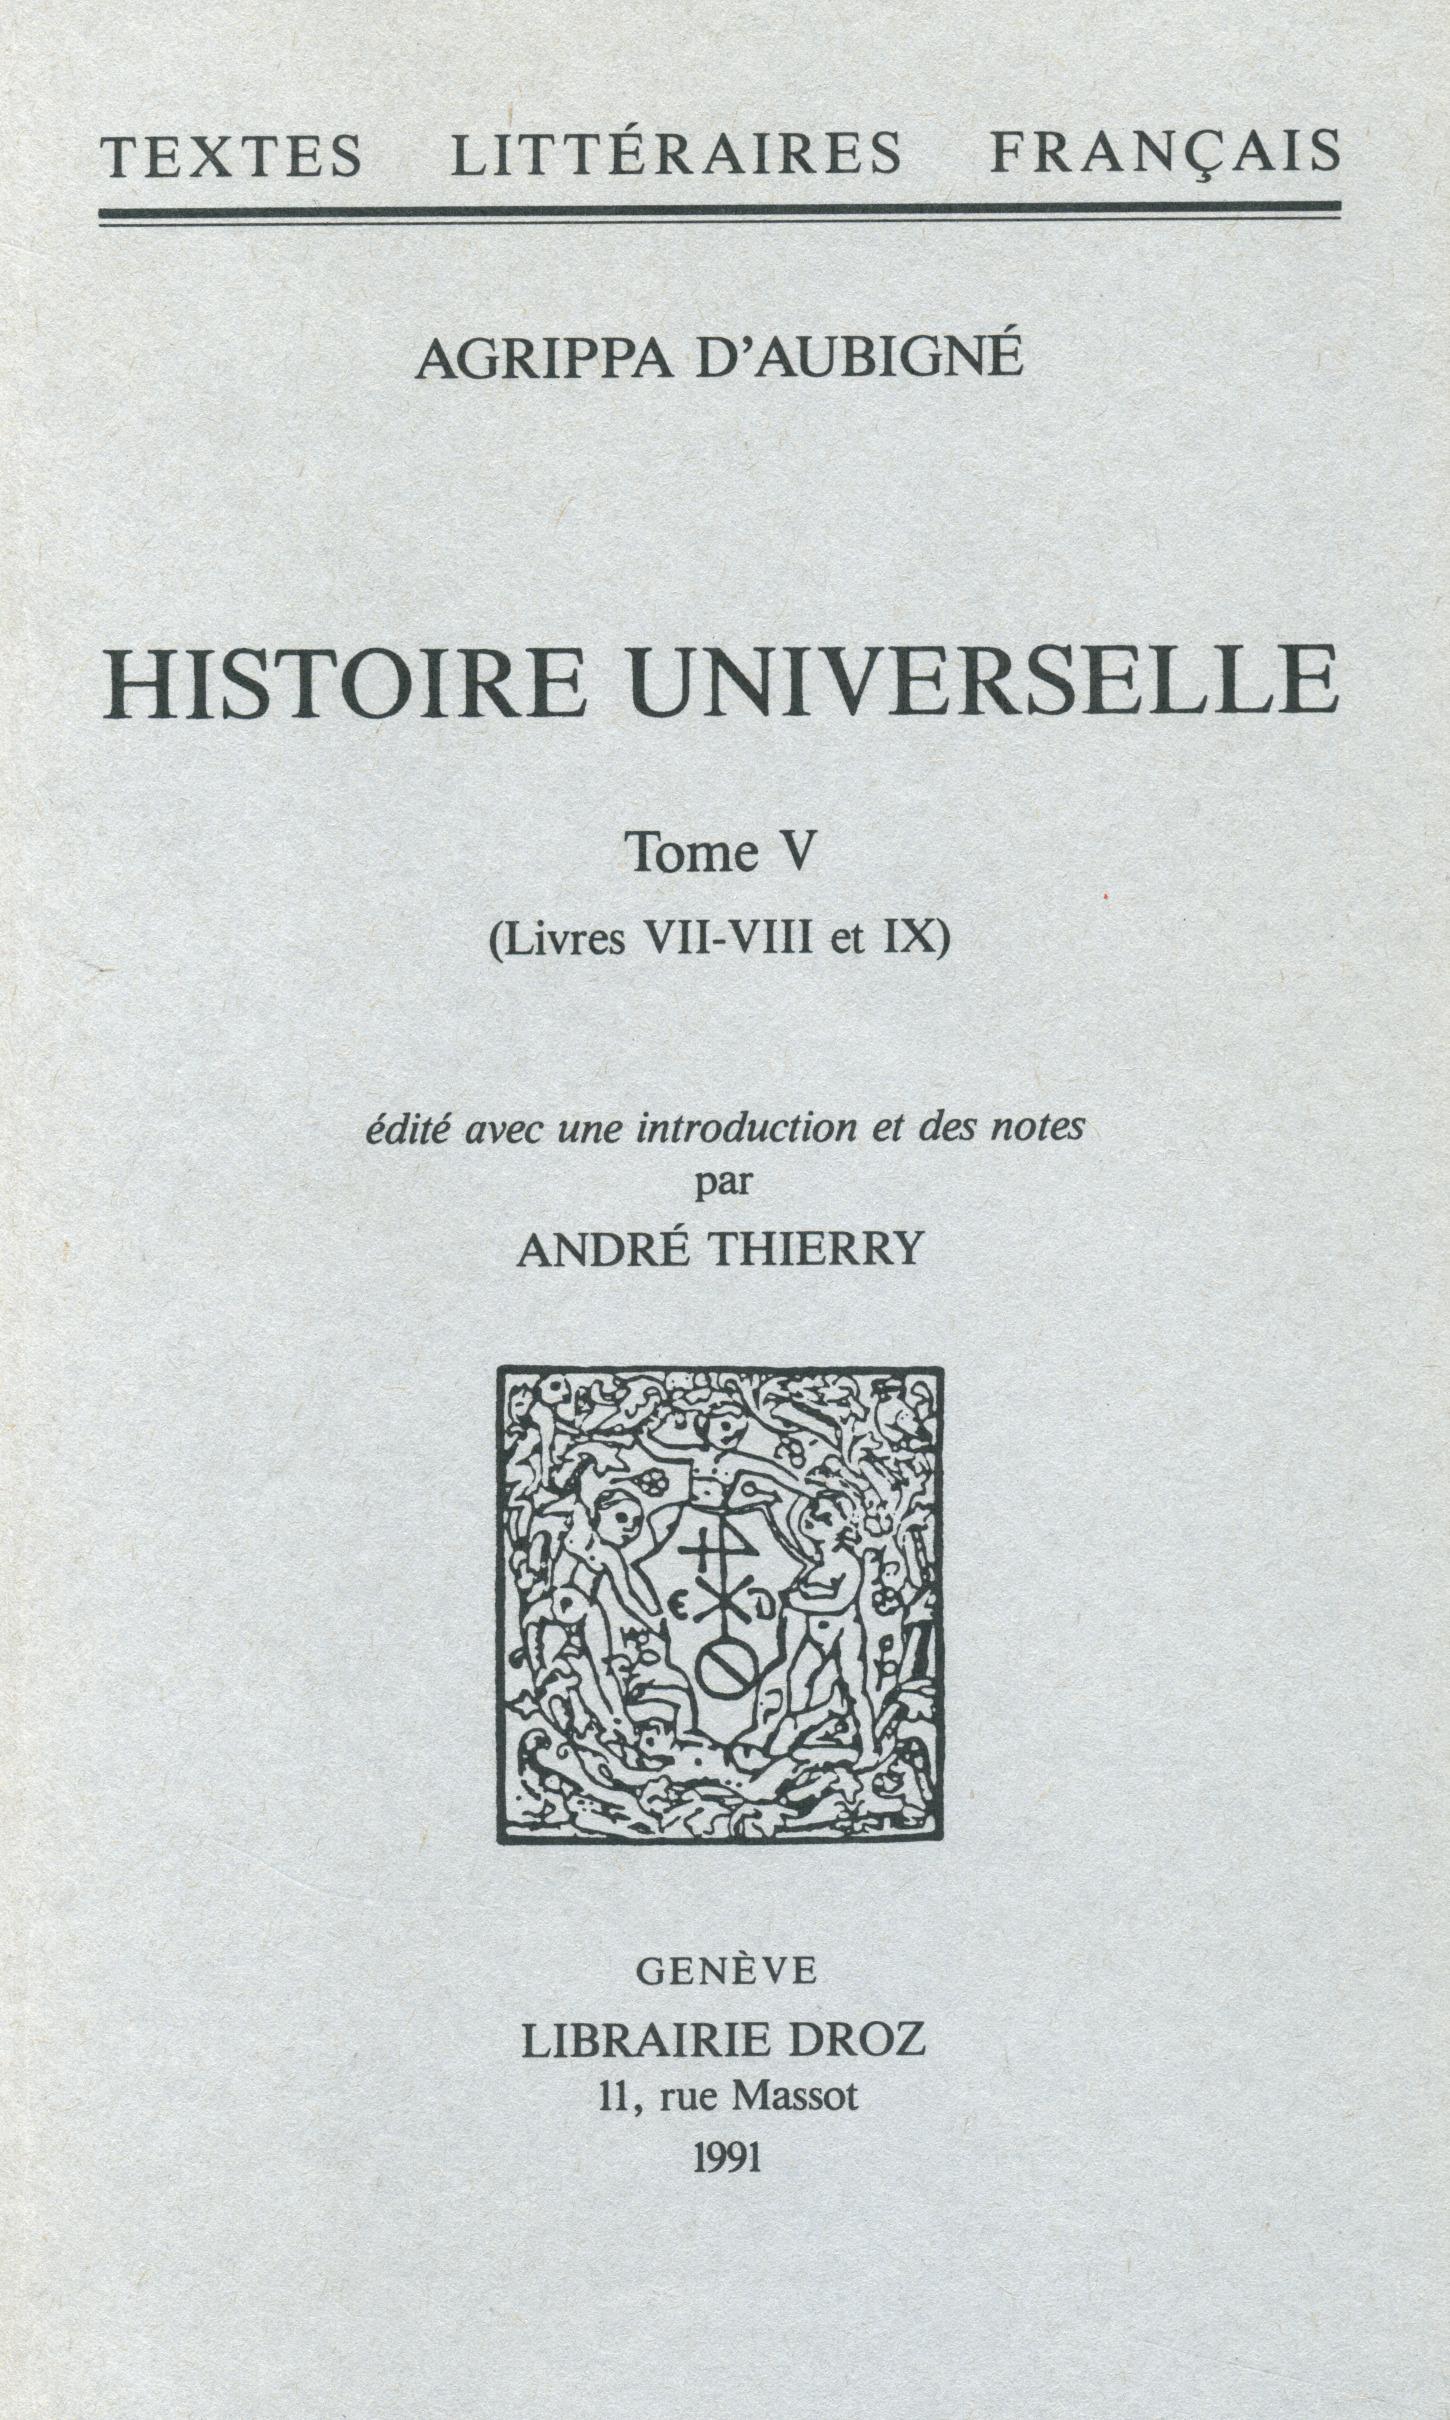 Histoire universelle  - Agrippa d'Aubigné